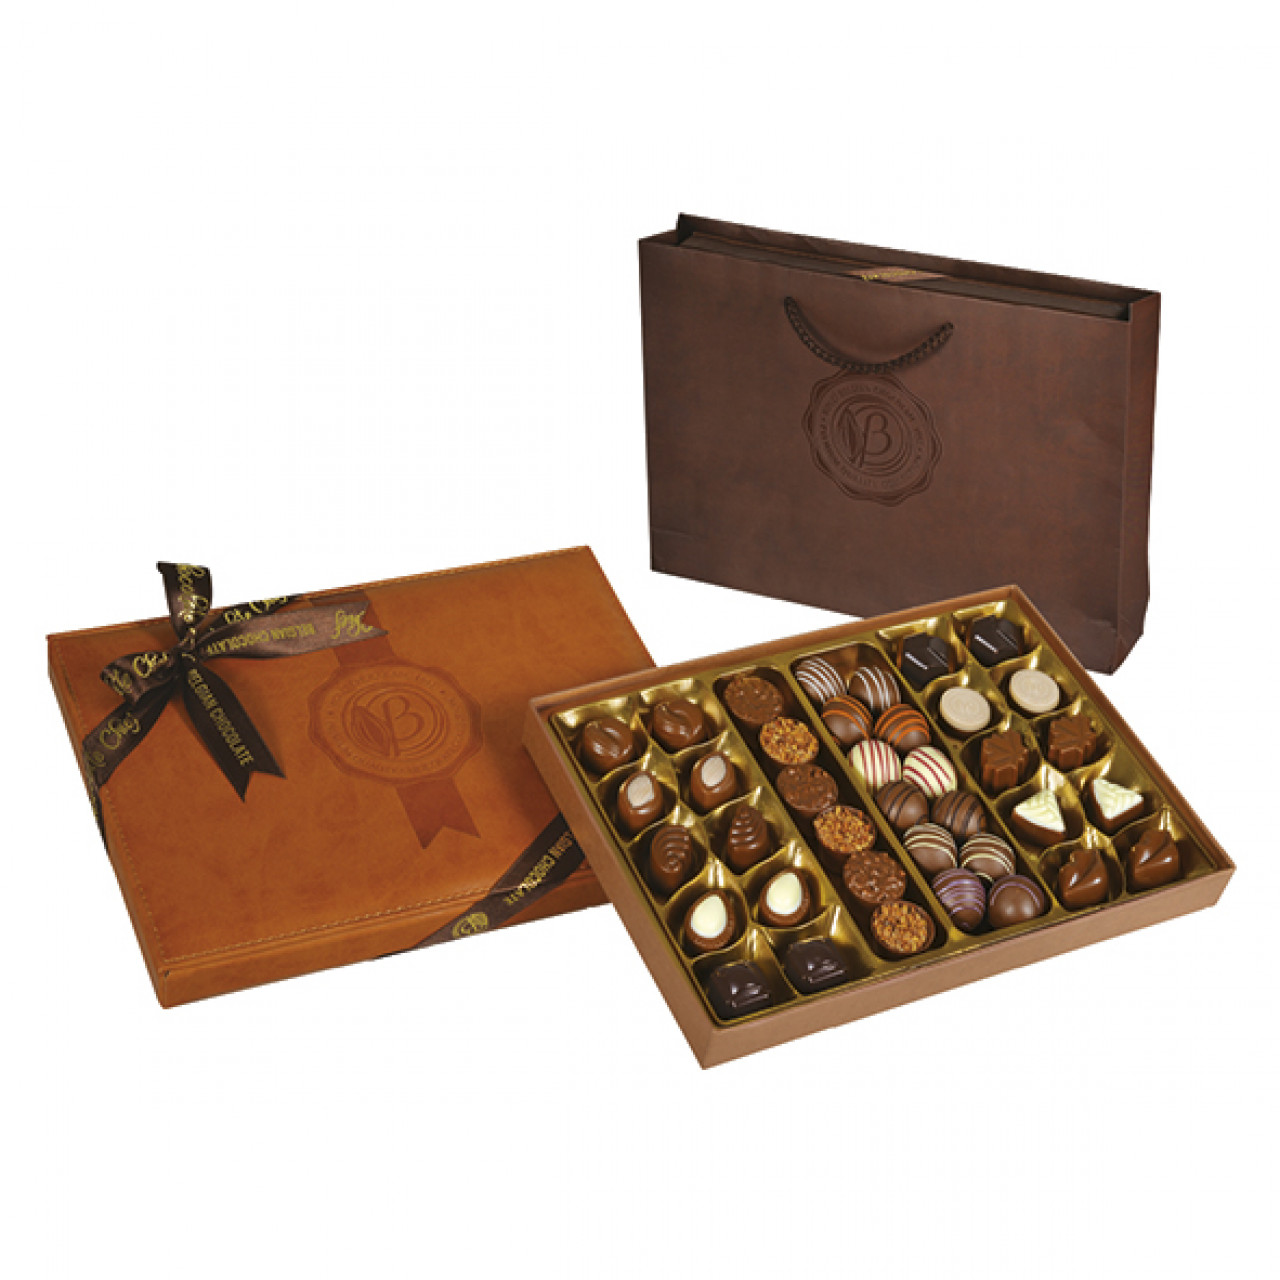 Special Çikolata Deri Taba Kutu 500 g